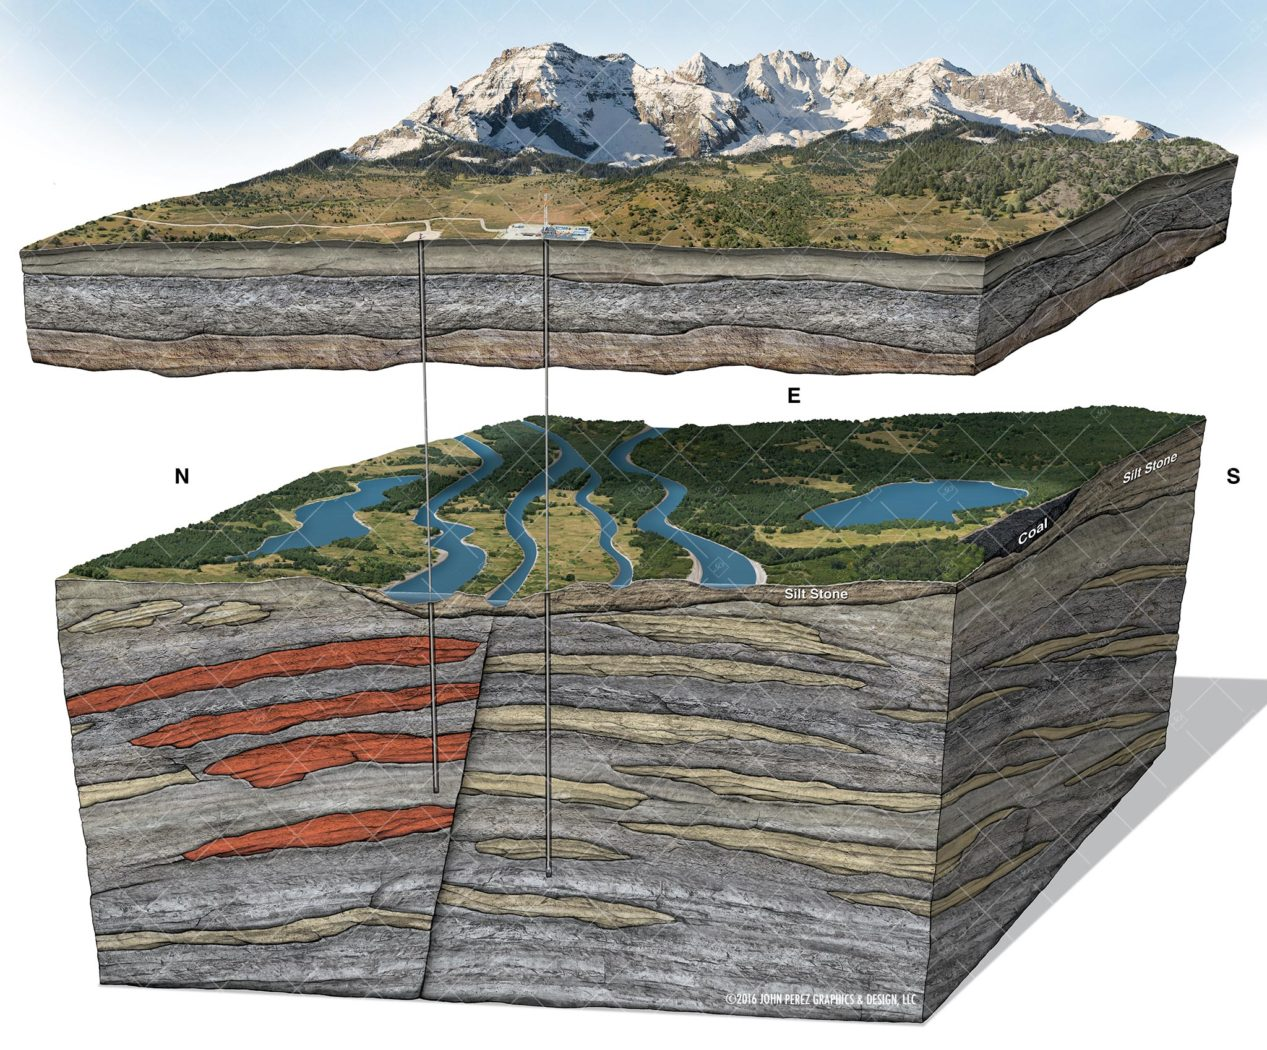 Channel Sand Deposition Schematic, drilling geology, oil and gas graphics, oil and gas schematics, john perez graphics, oil and gas illustration